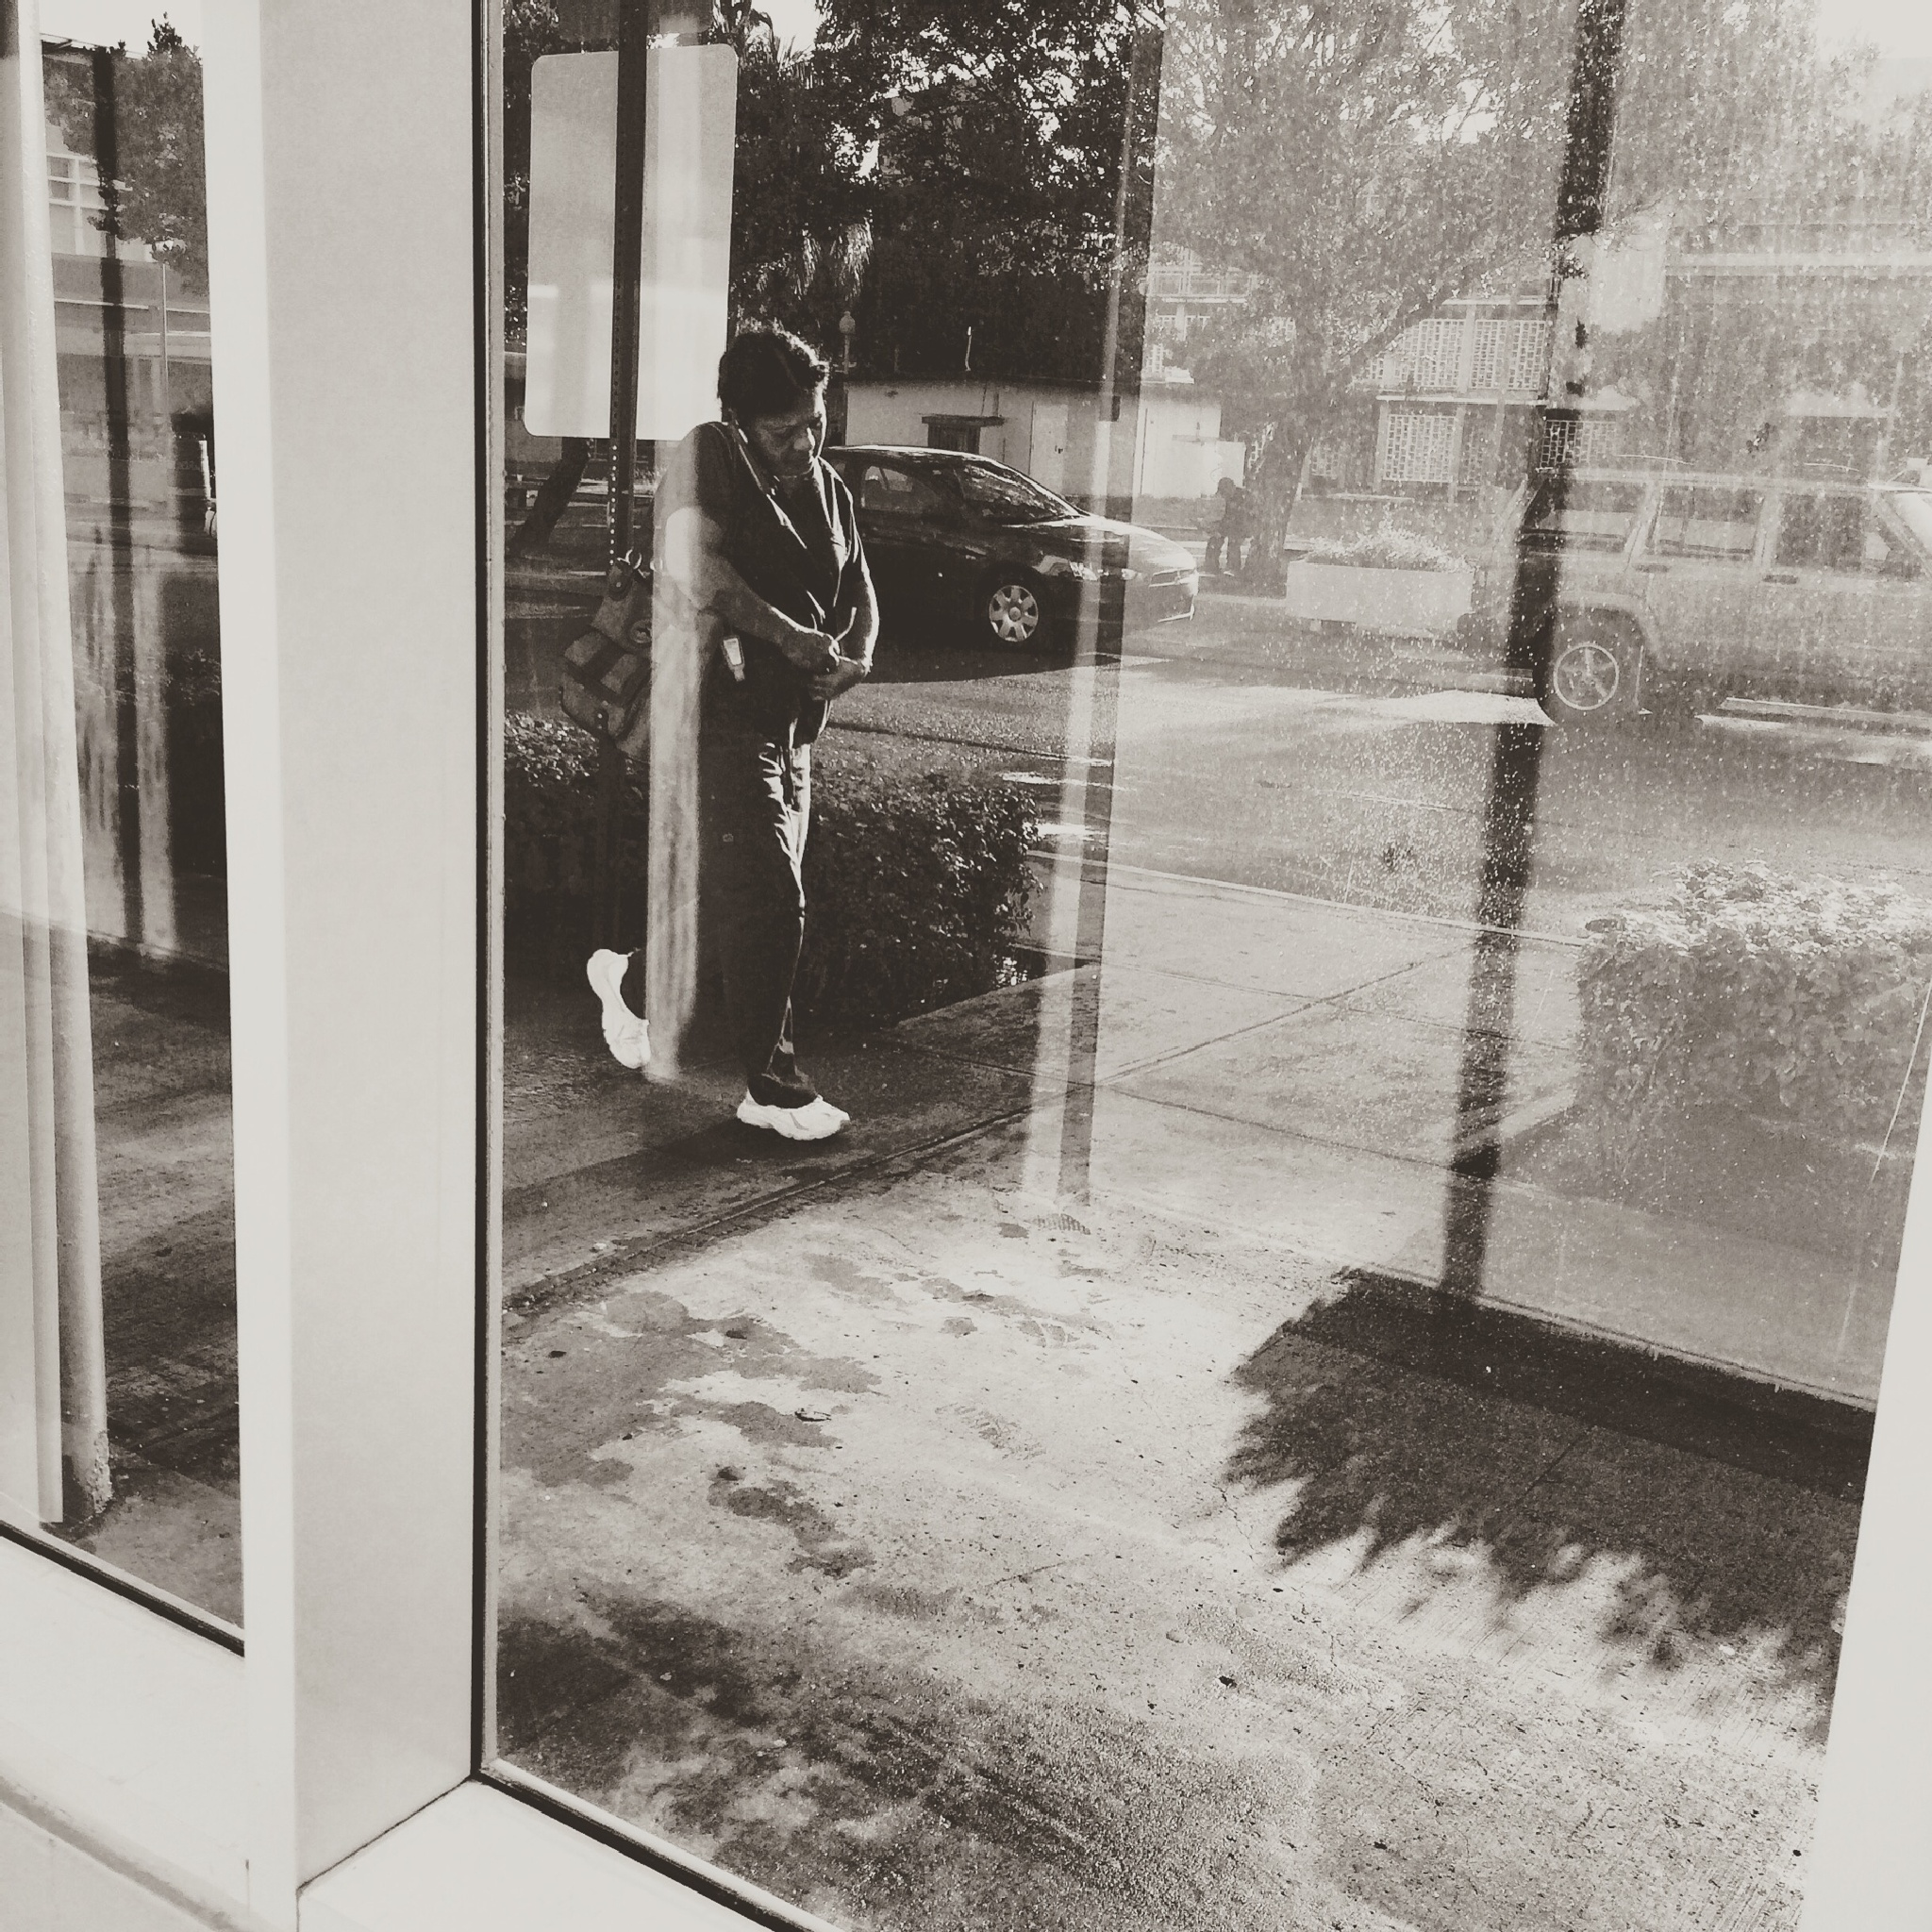 Thru the window by Nilda64pr